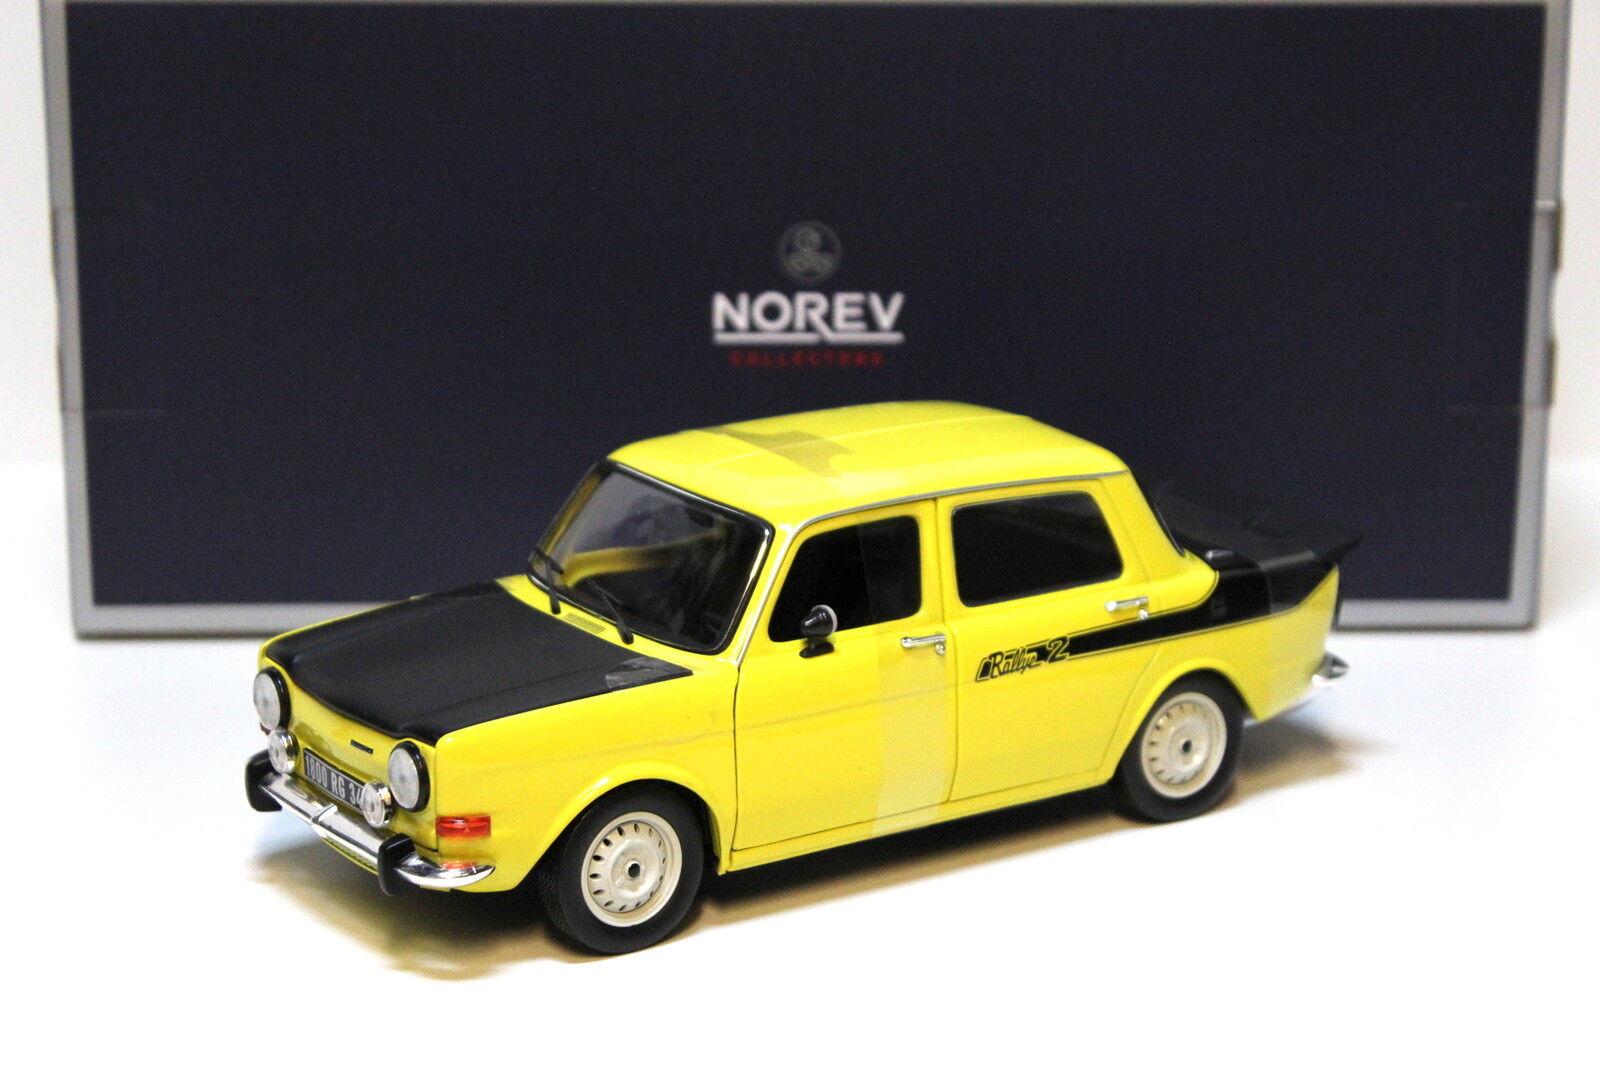 1 18 Norev Simca 1000 Rallye 2 jaune 1976 New chez Premium-modelcars